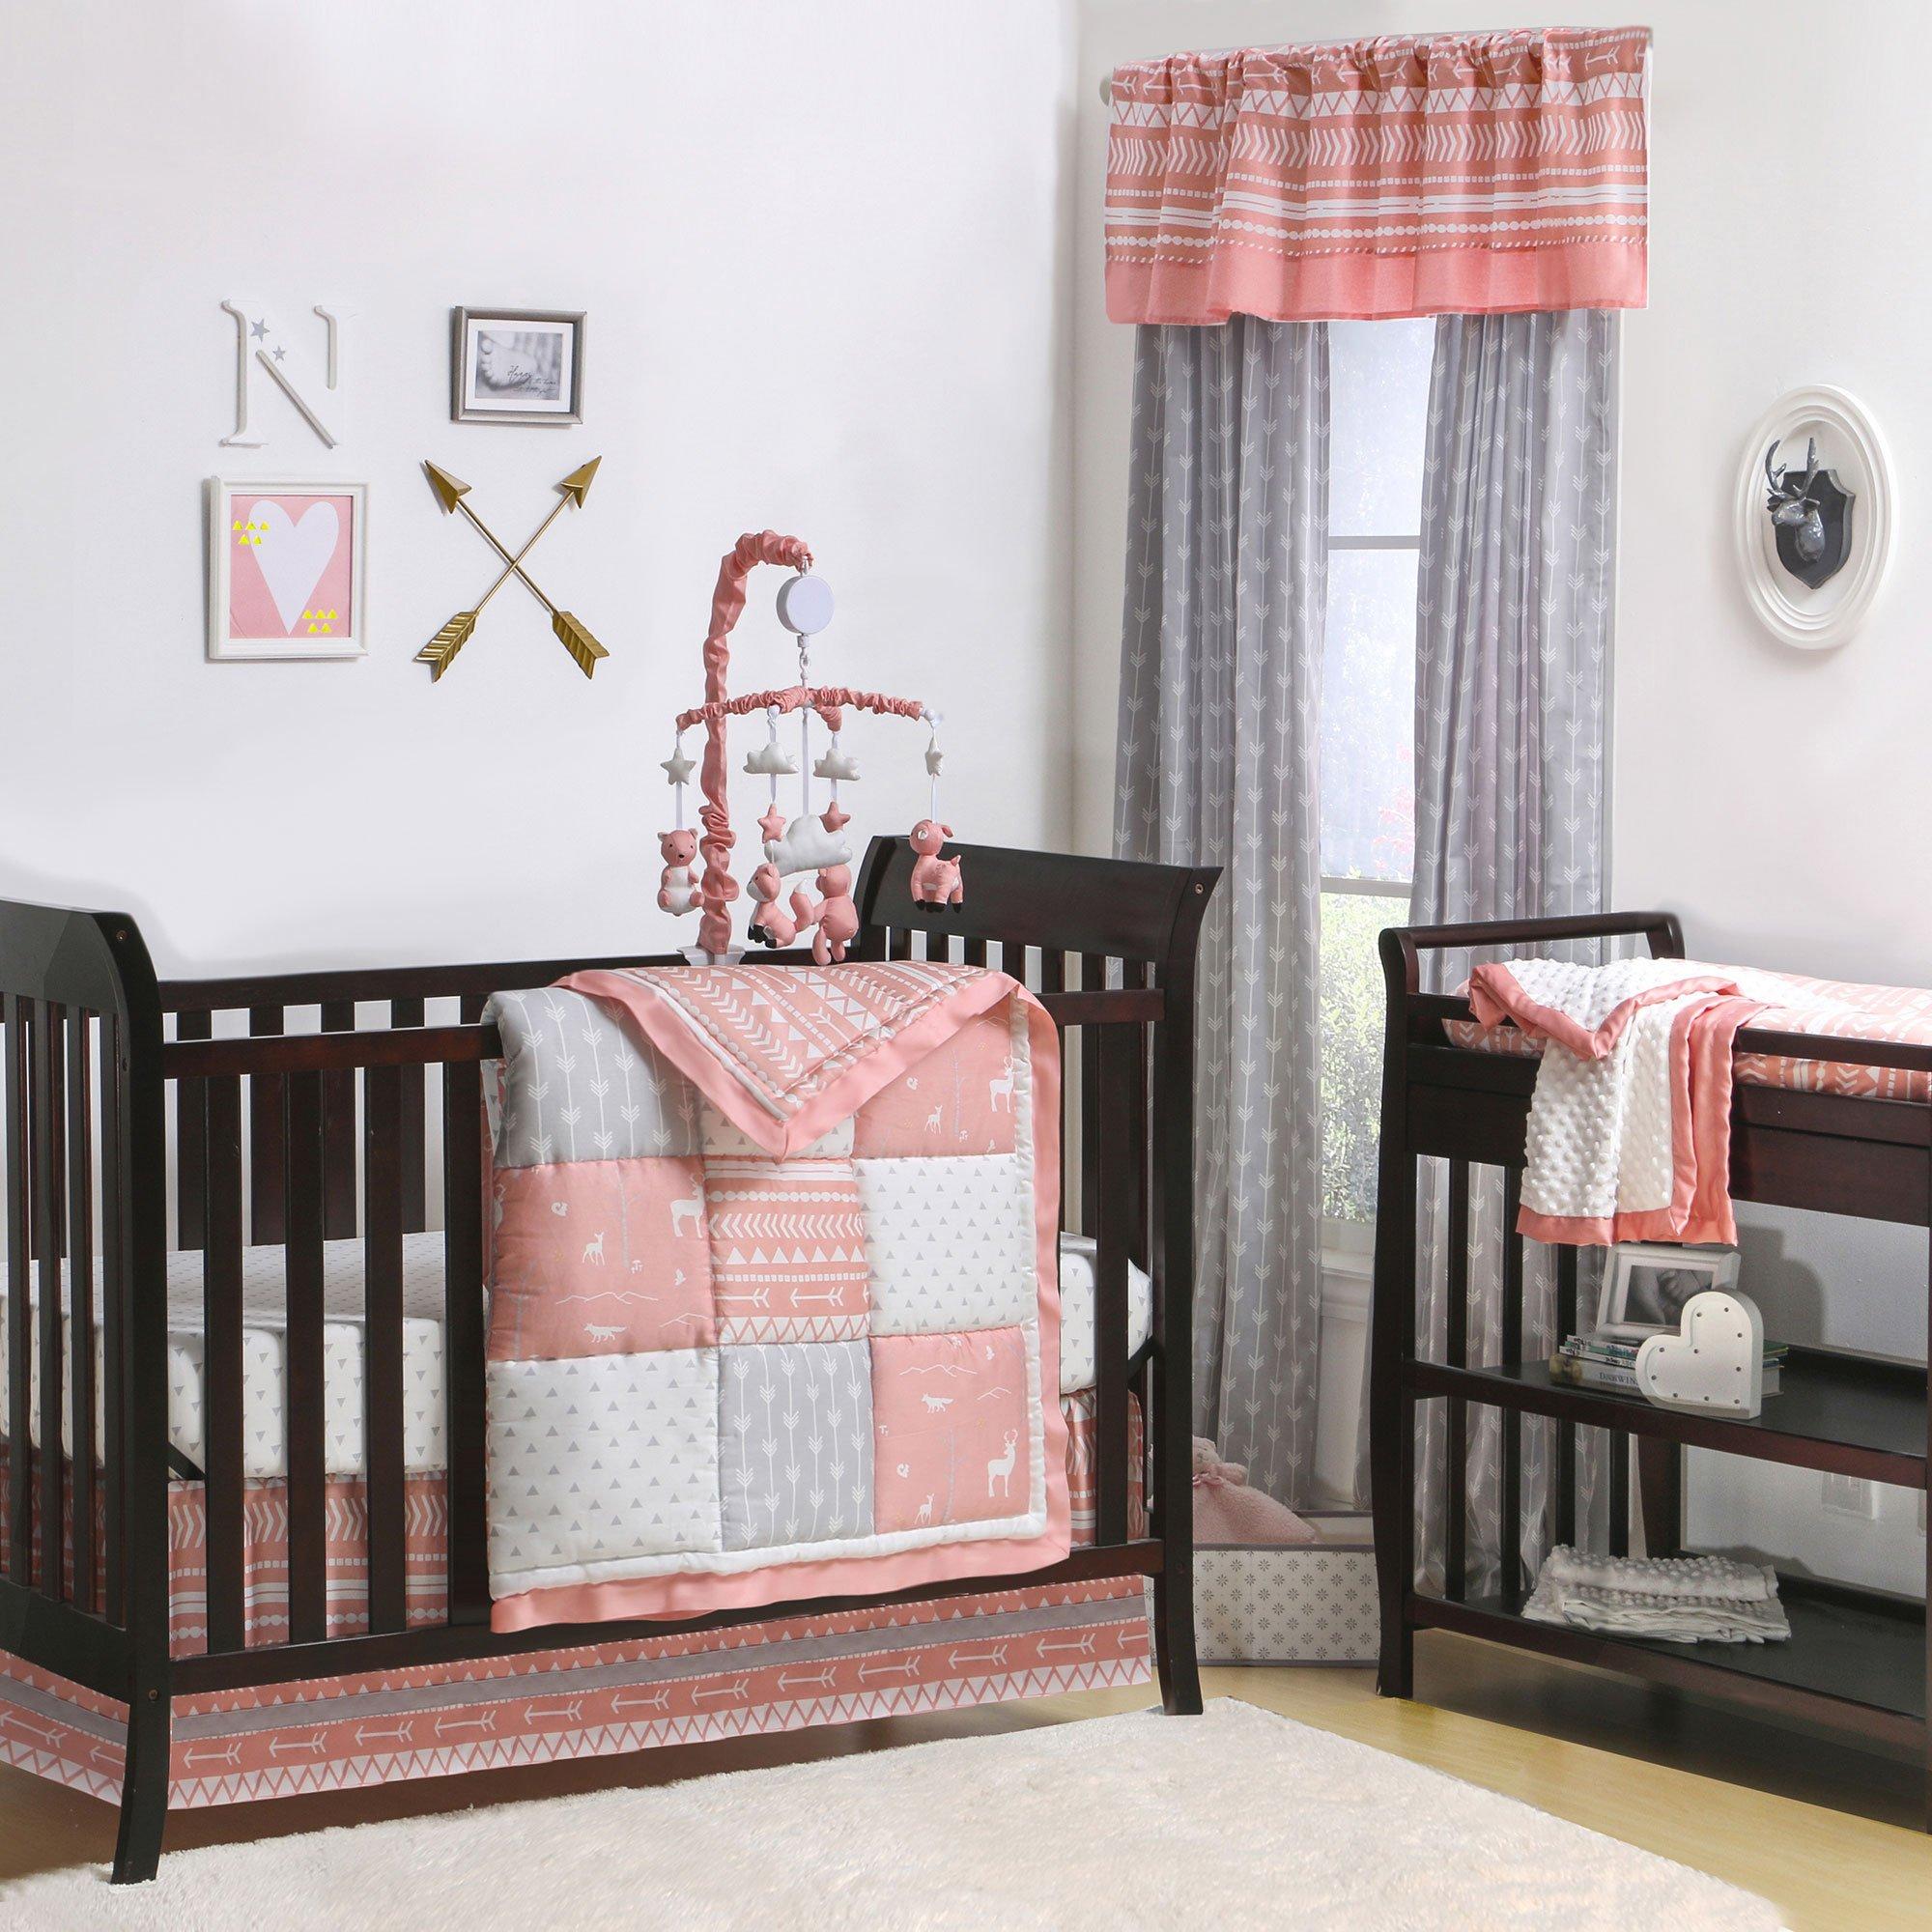 Woodland Pixie Coral and Grey Baby Crib Bedding - 11 Piece Sleep Essentials Set